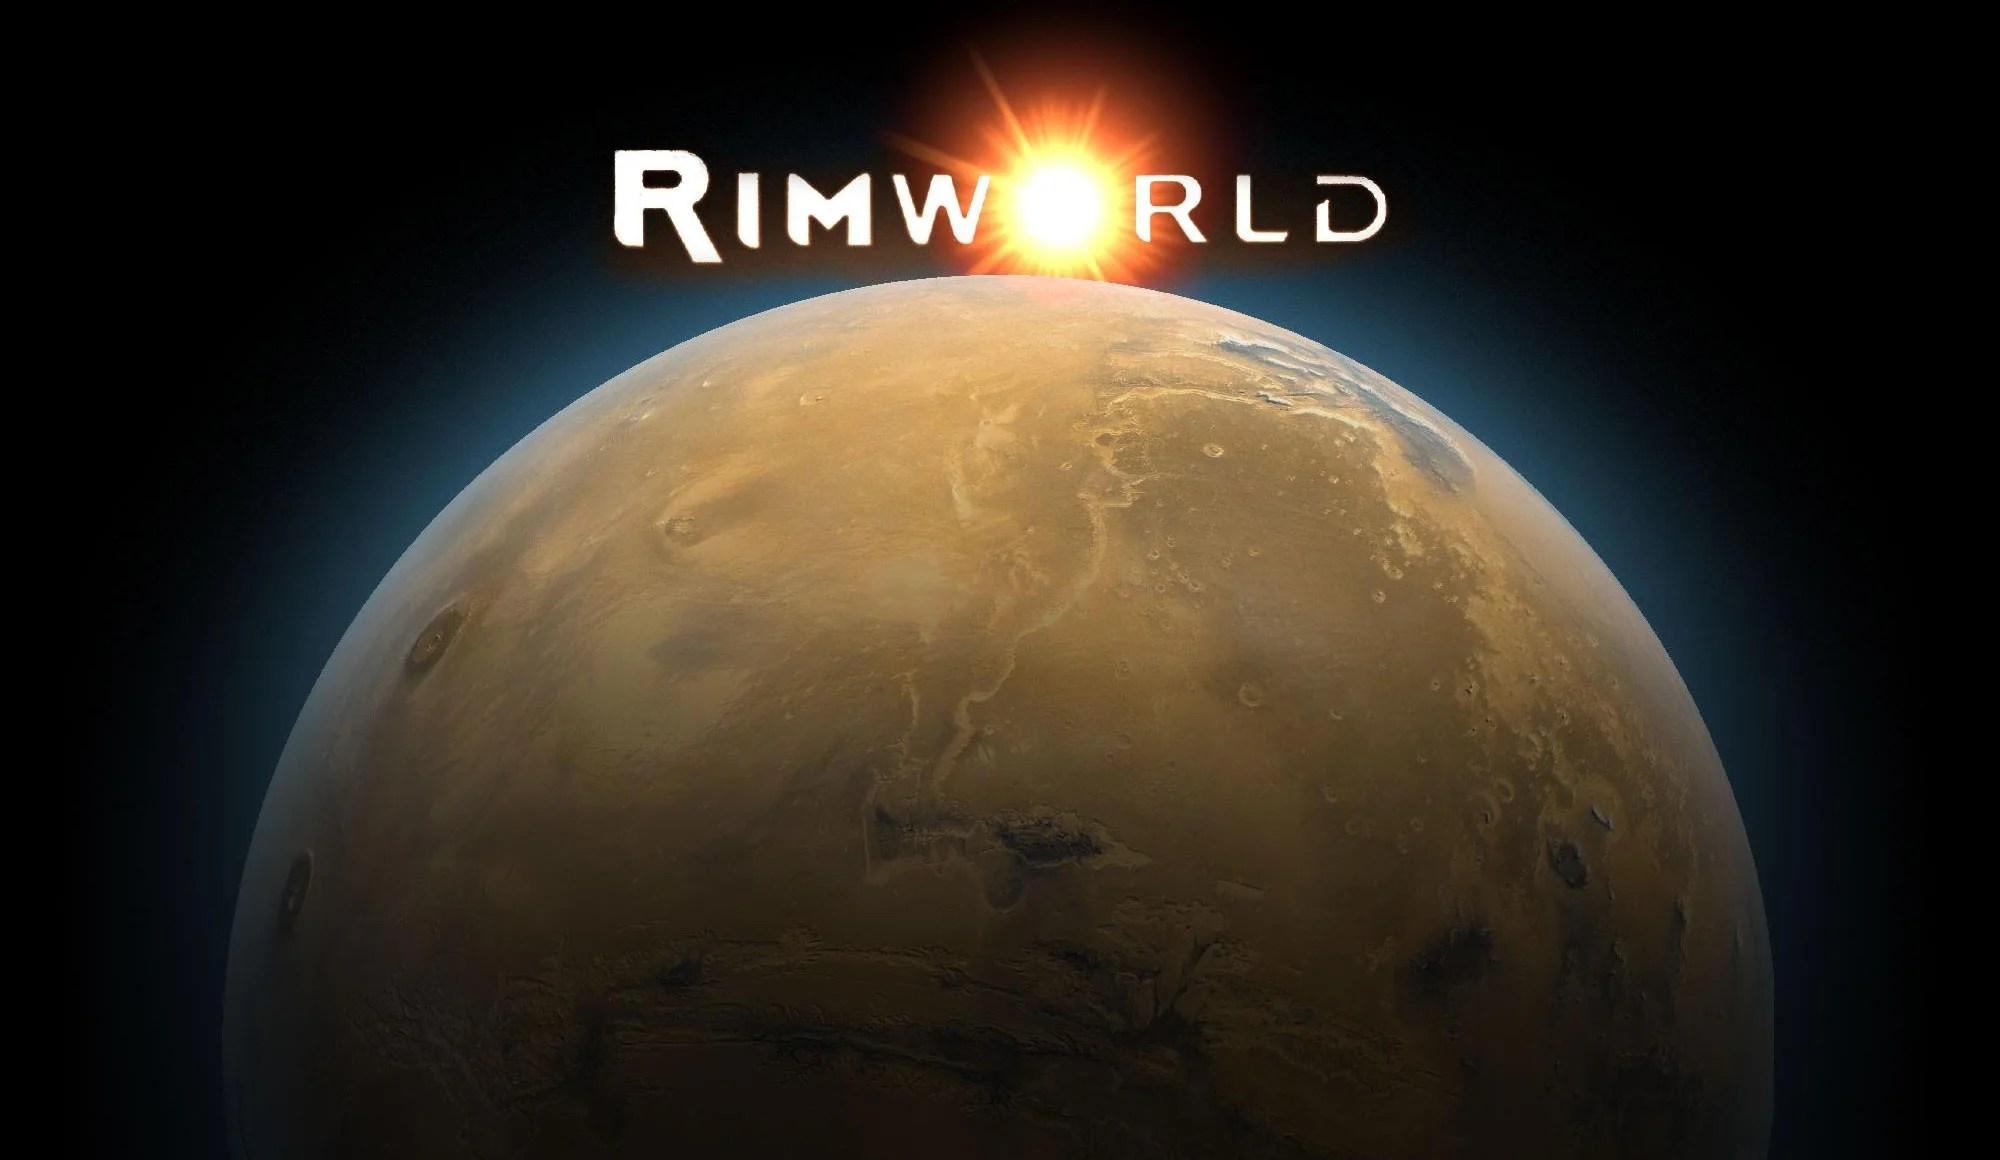 Diablo Hd Wallpaper Tips For Getting Started In Rimworld Kotaku Australia